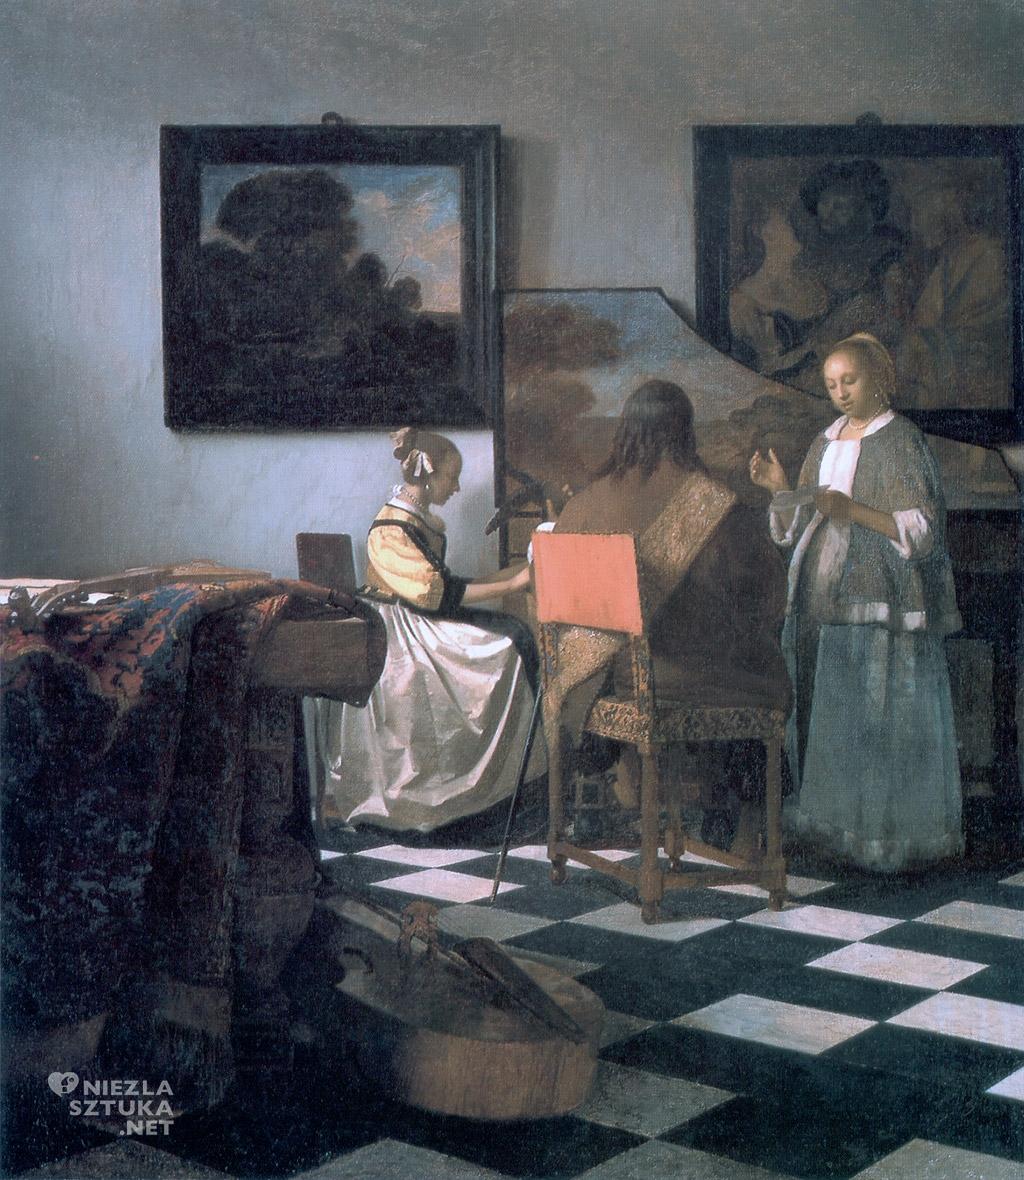 Johannes Vermeer, Koncert, skradziony obraz, malarstwo holenderskie, Niezła sztuka